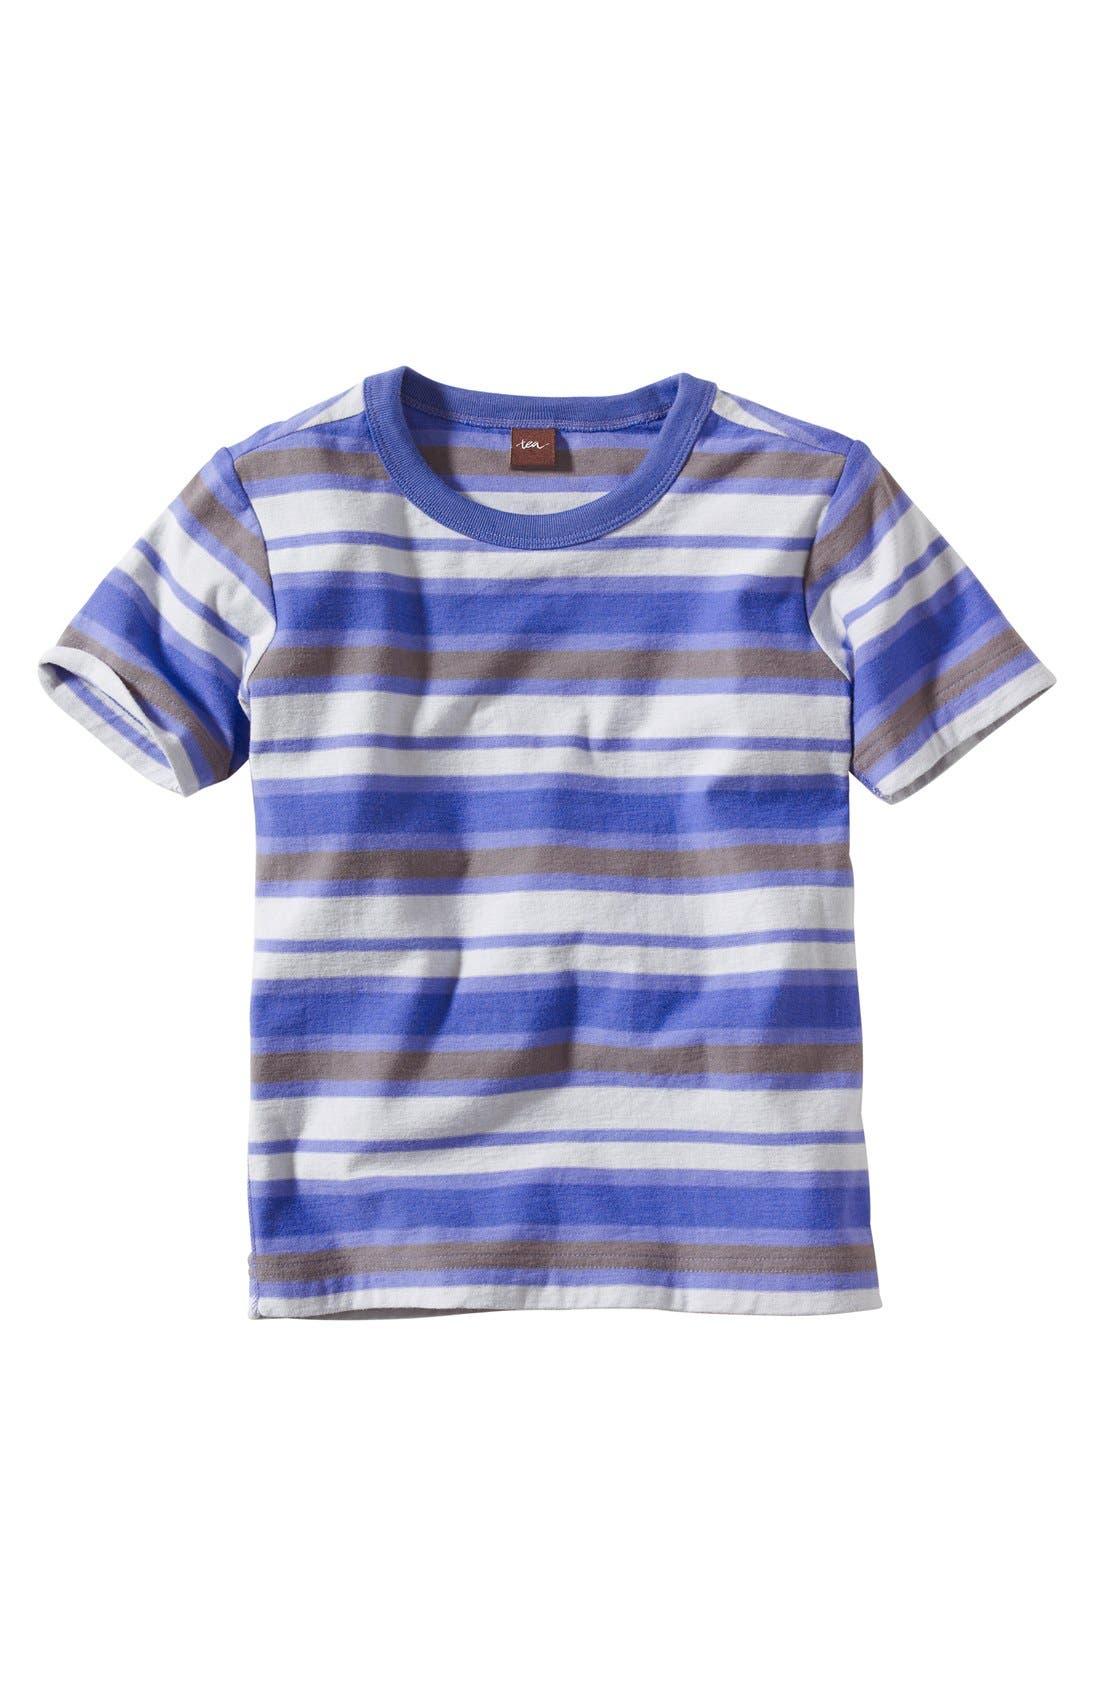 Main Image - Tea Collection 'Majorelle' Stripe T-Shirt (Little Boys & Big Boys)